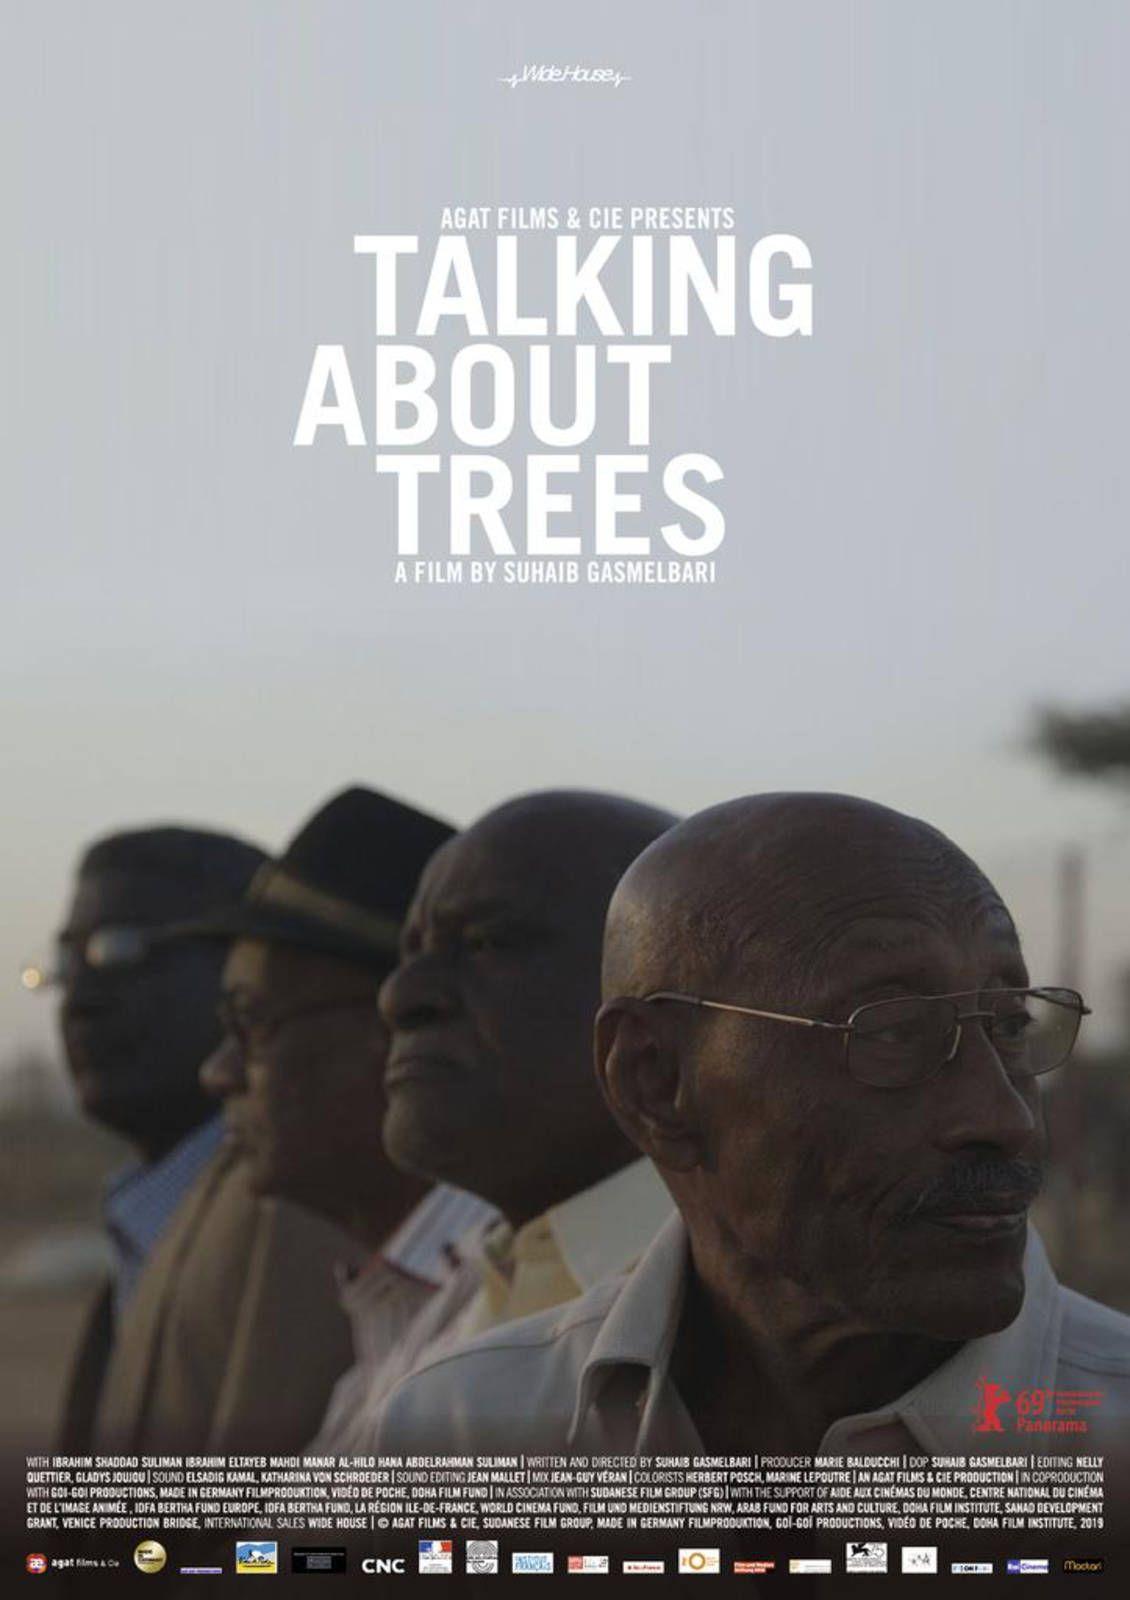 Talking about trees / Suhaib Gasmelbari 2019 (Festival